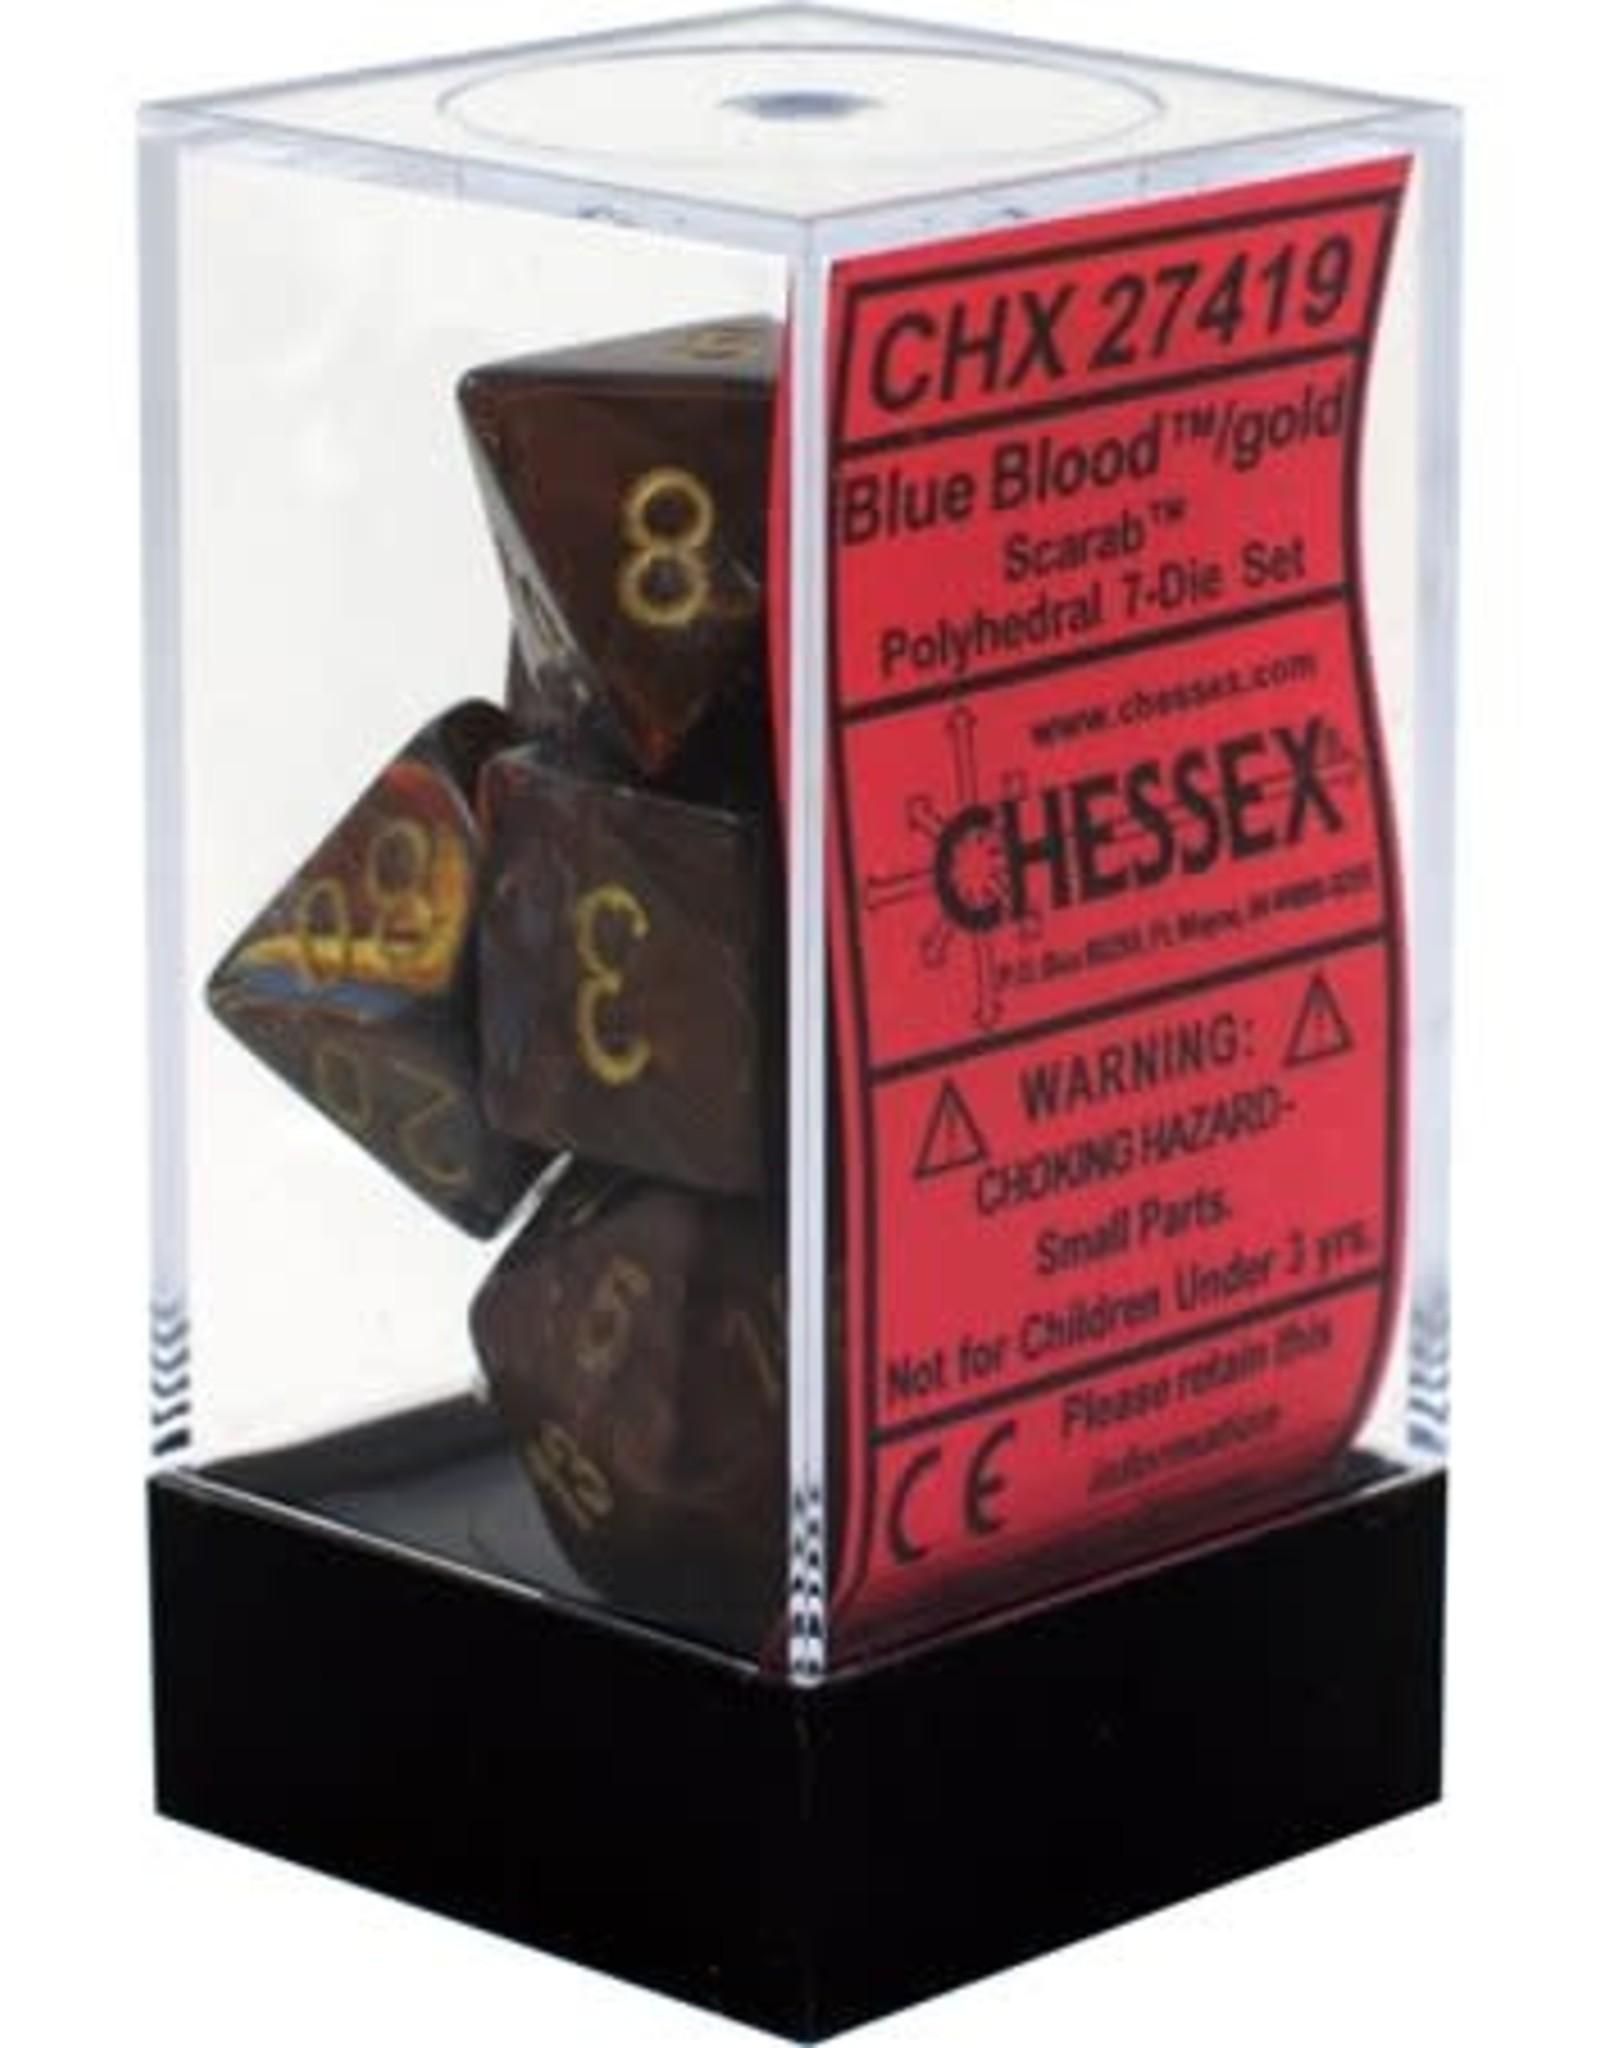 Chessex Scarab Blue Blood w/Gold Polyhedral Set